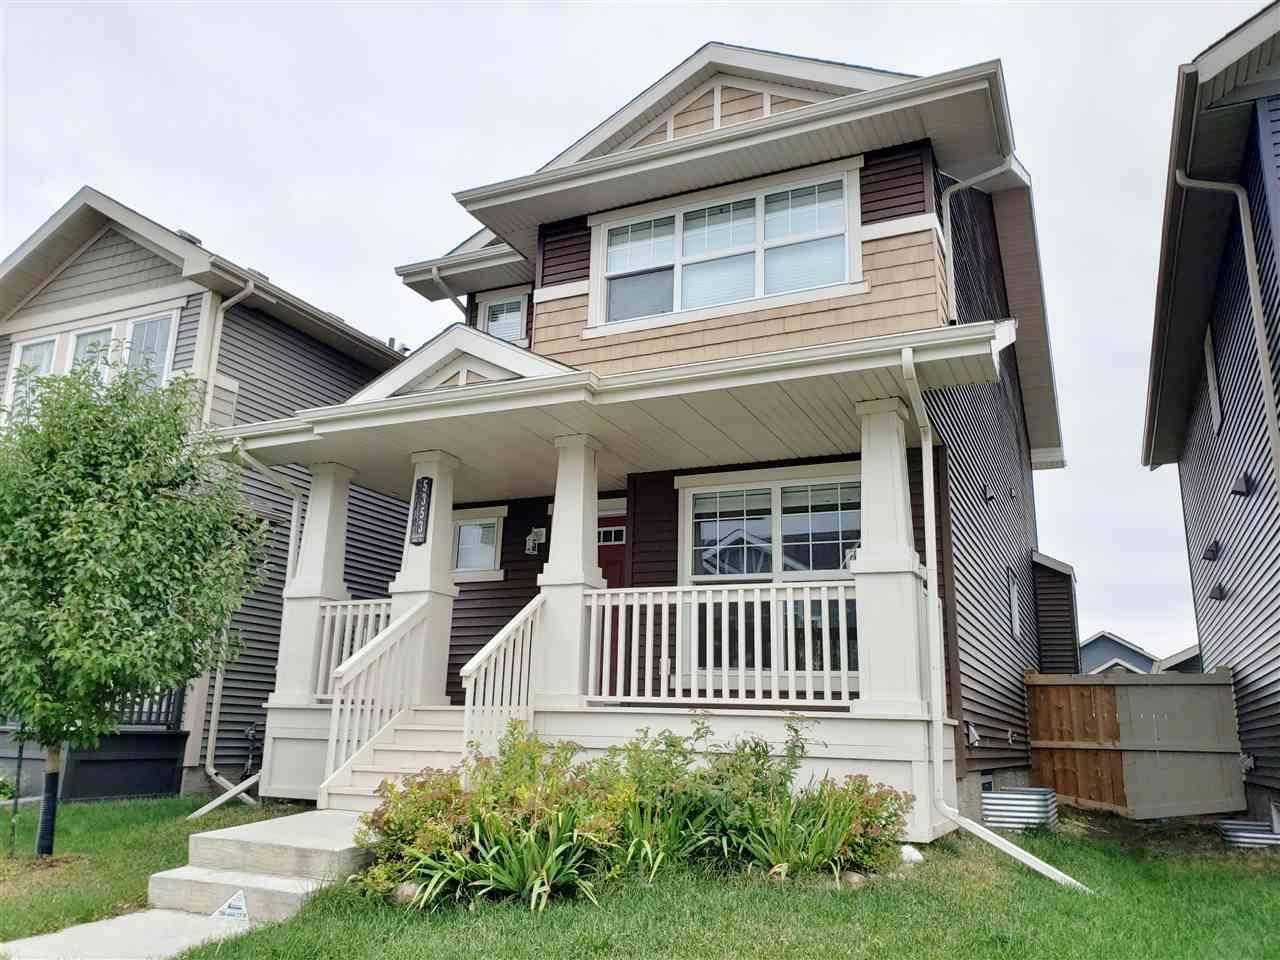 House for sale at 5353 Crabapple Lo  Sw Edmonton Alberta - MLS: E4174288